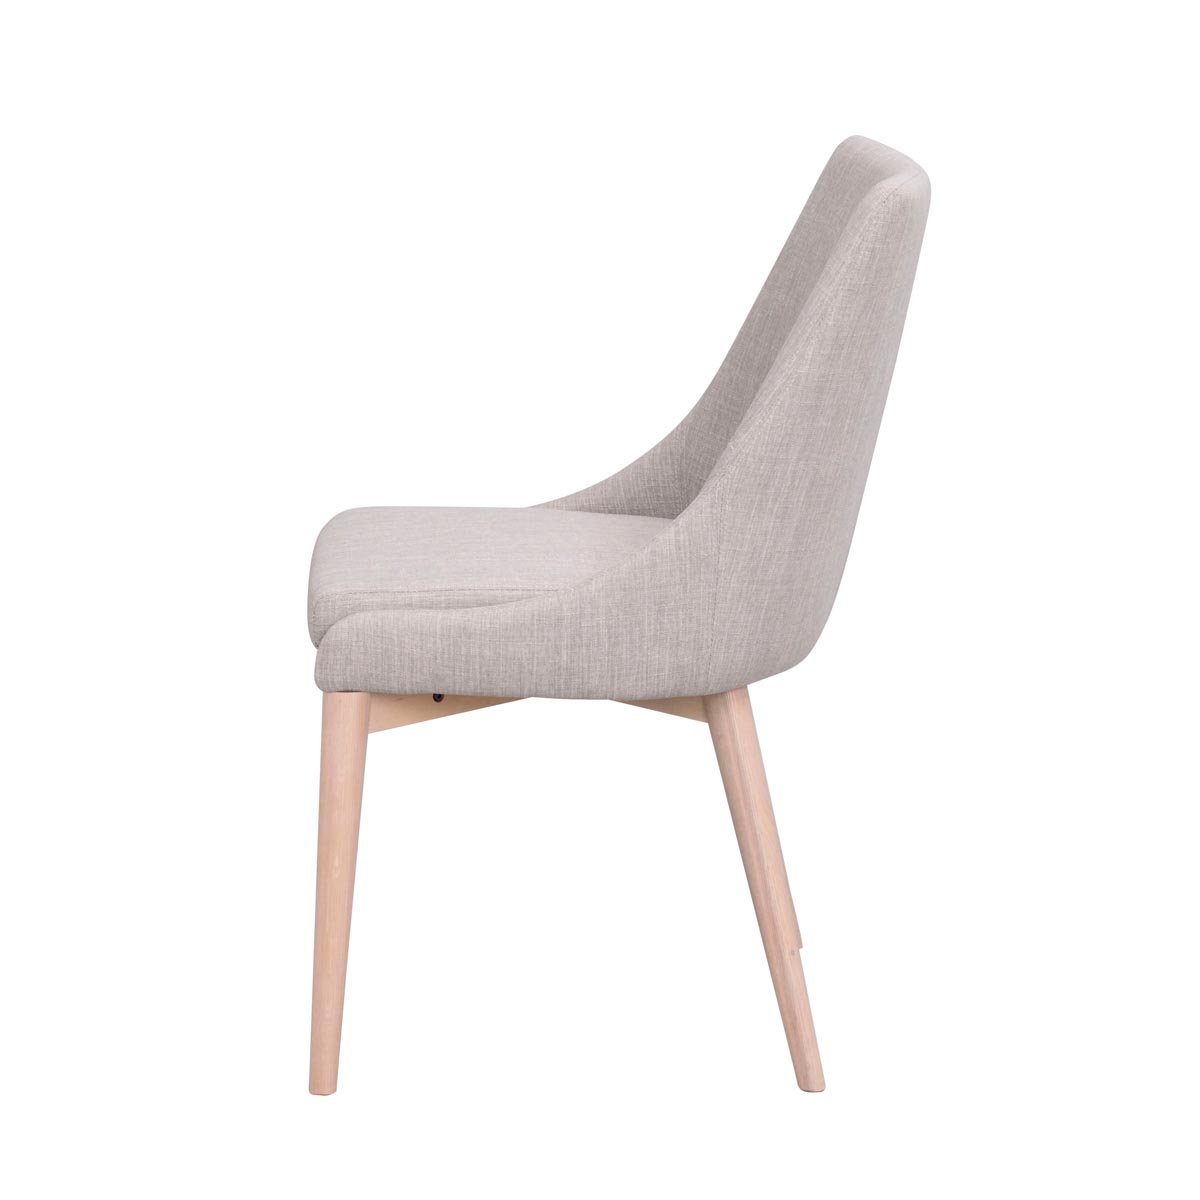 Bea-stol-ljusgrått-tyg_wwR-118312_c